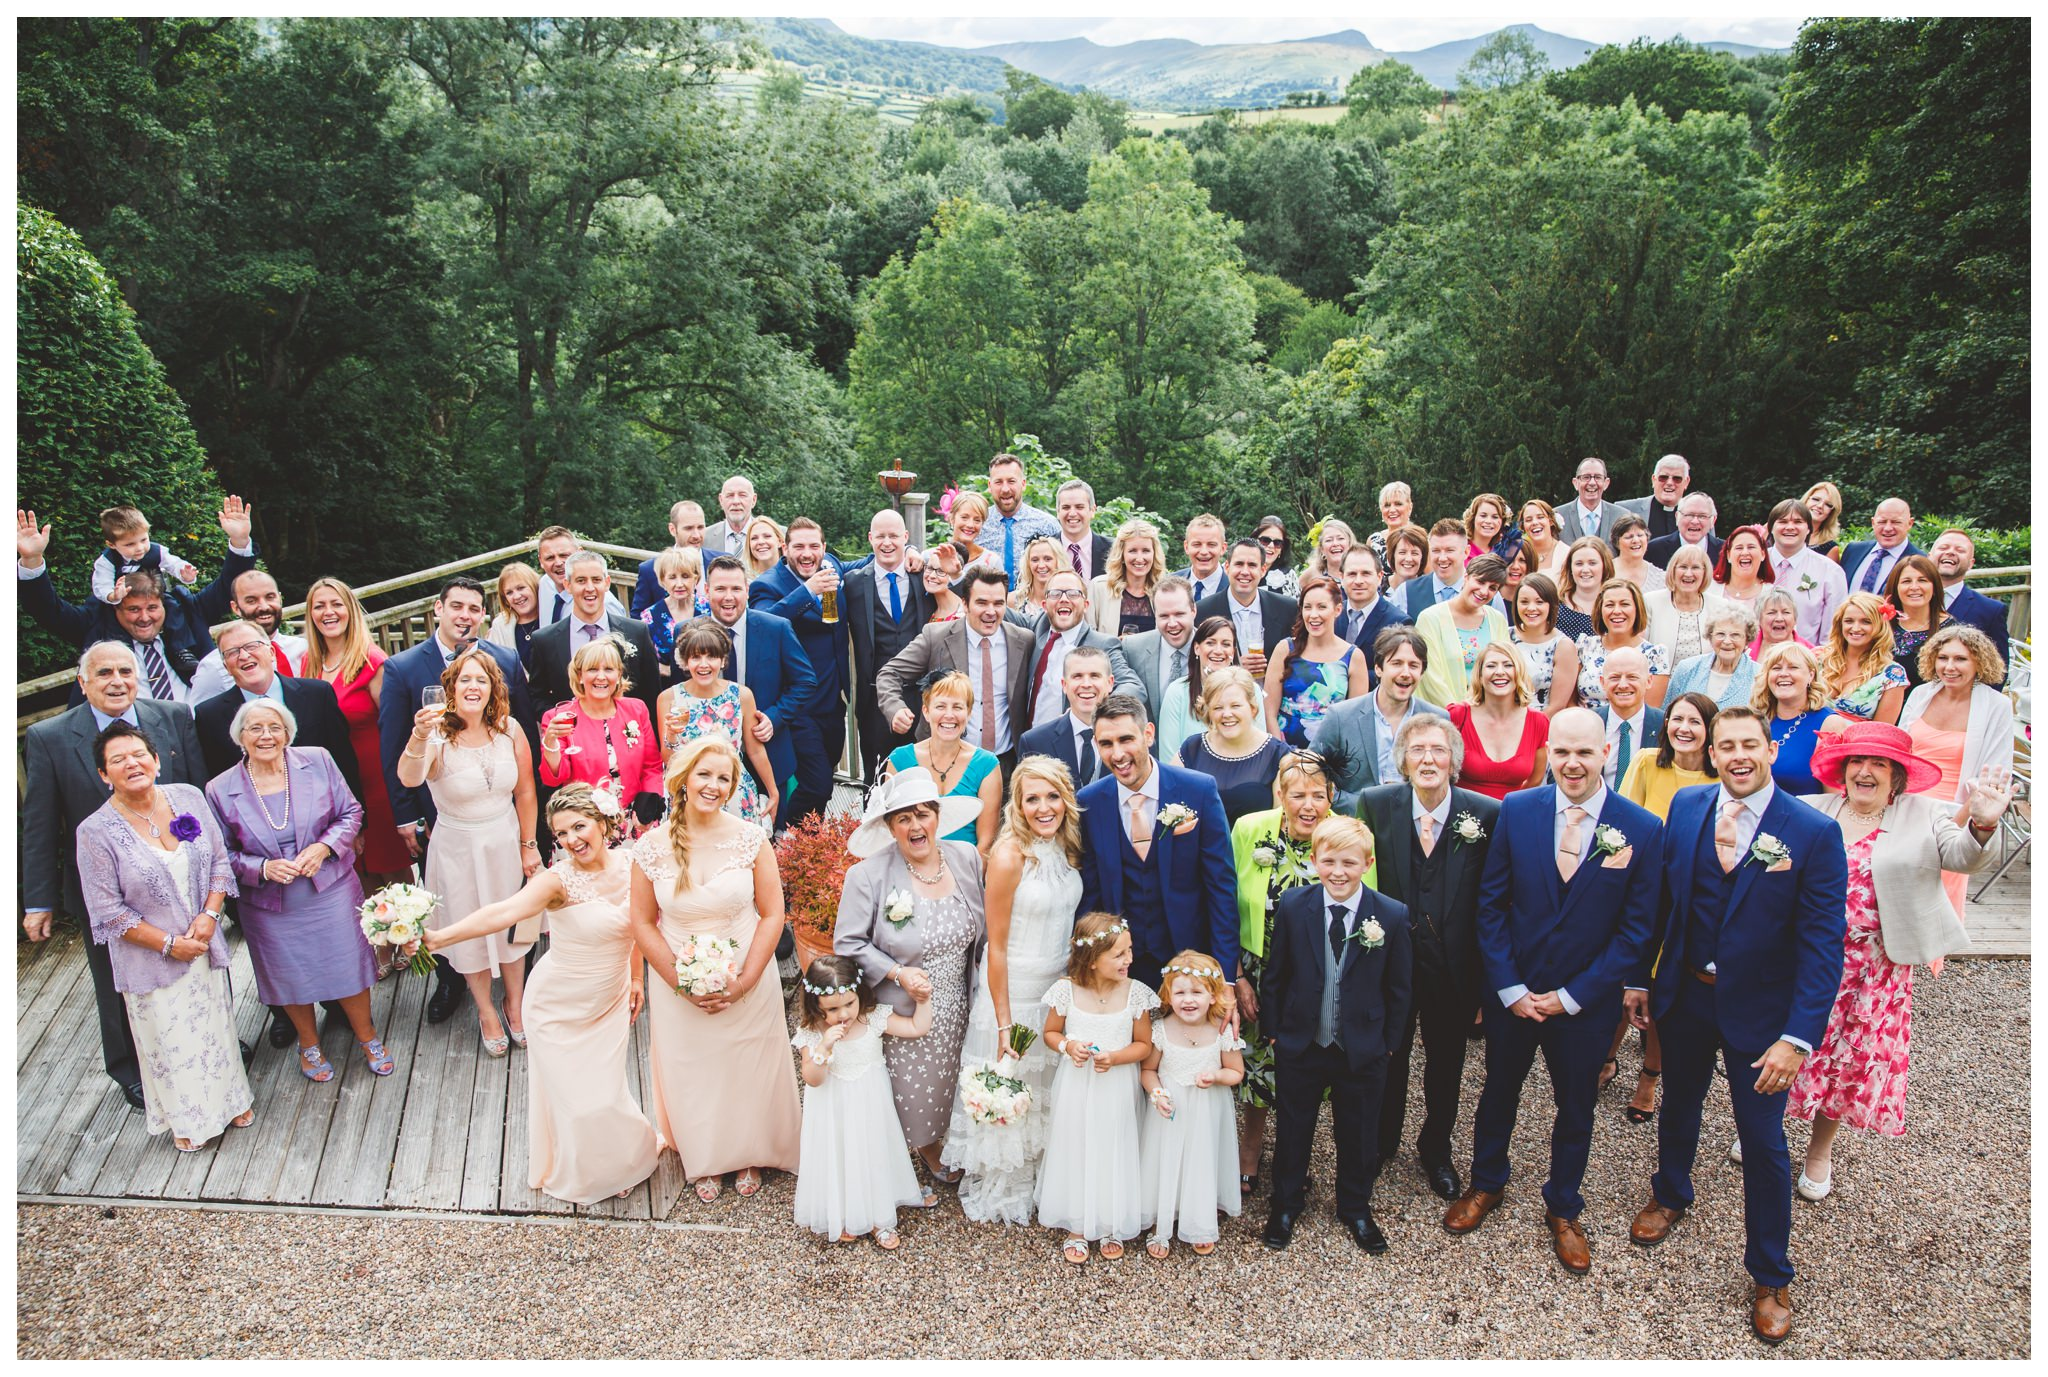 Richard Savage Photography - Wedding - Peterstone Court Brecon - 2016-05-11_0035